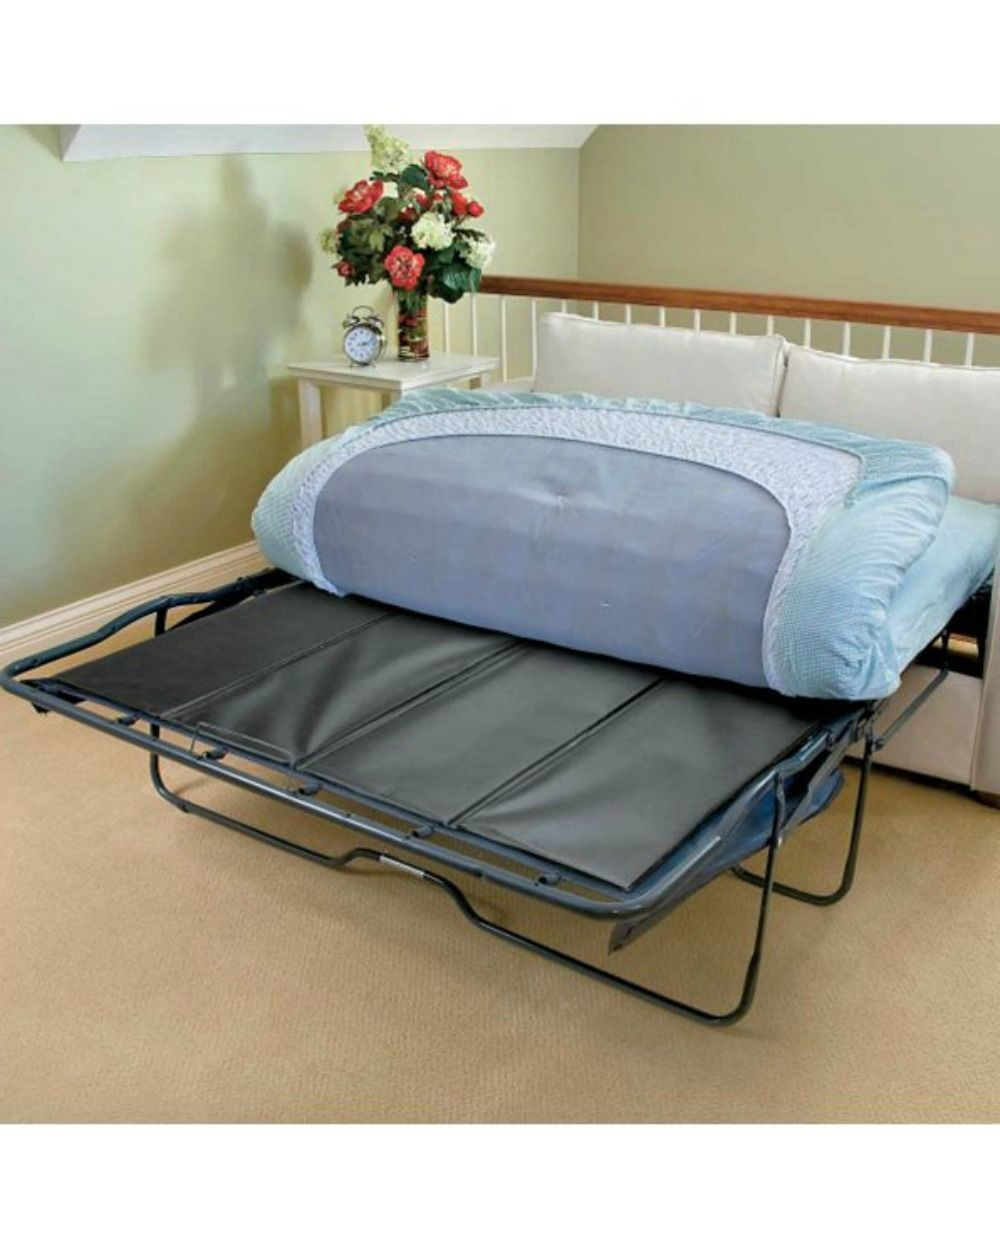 Sleeper Sofa Bed Bar Shield Folding Support Board For Under